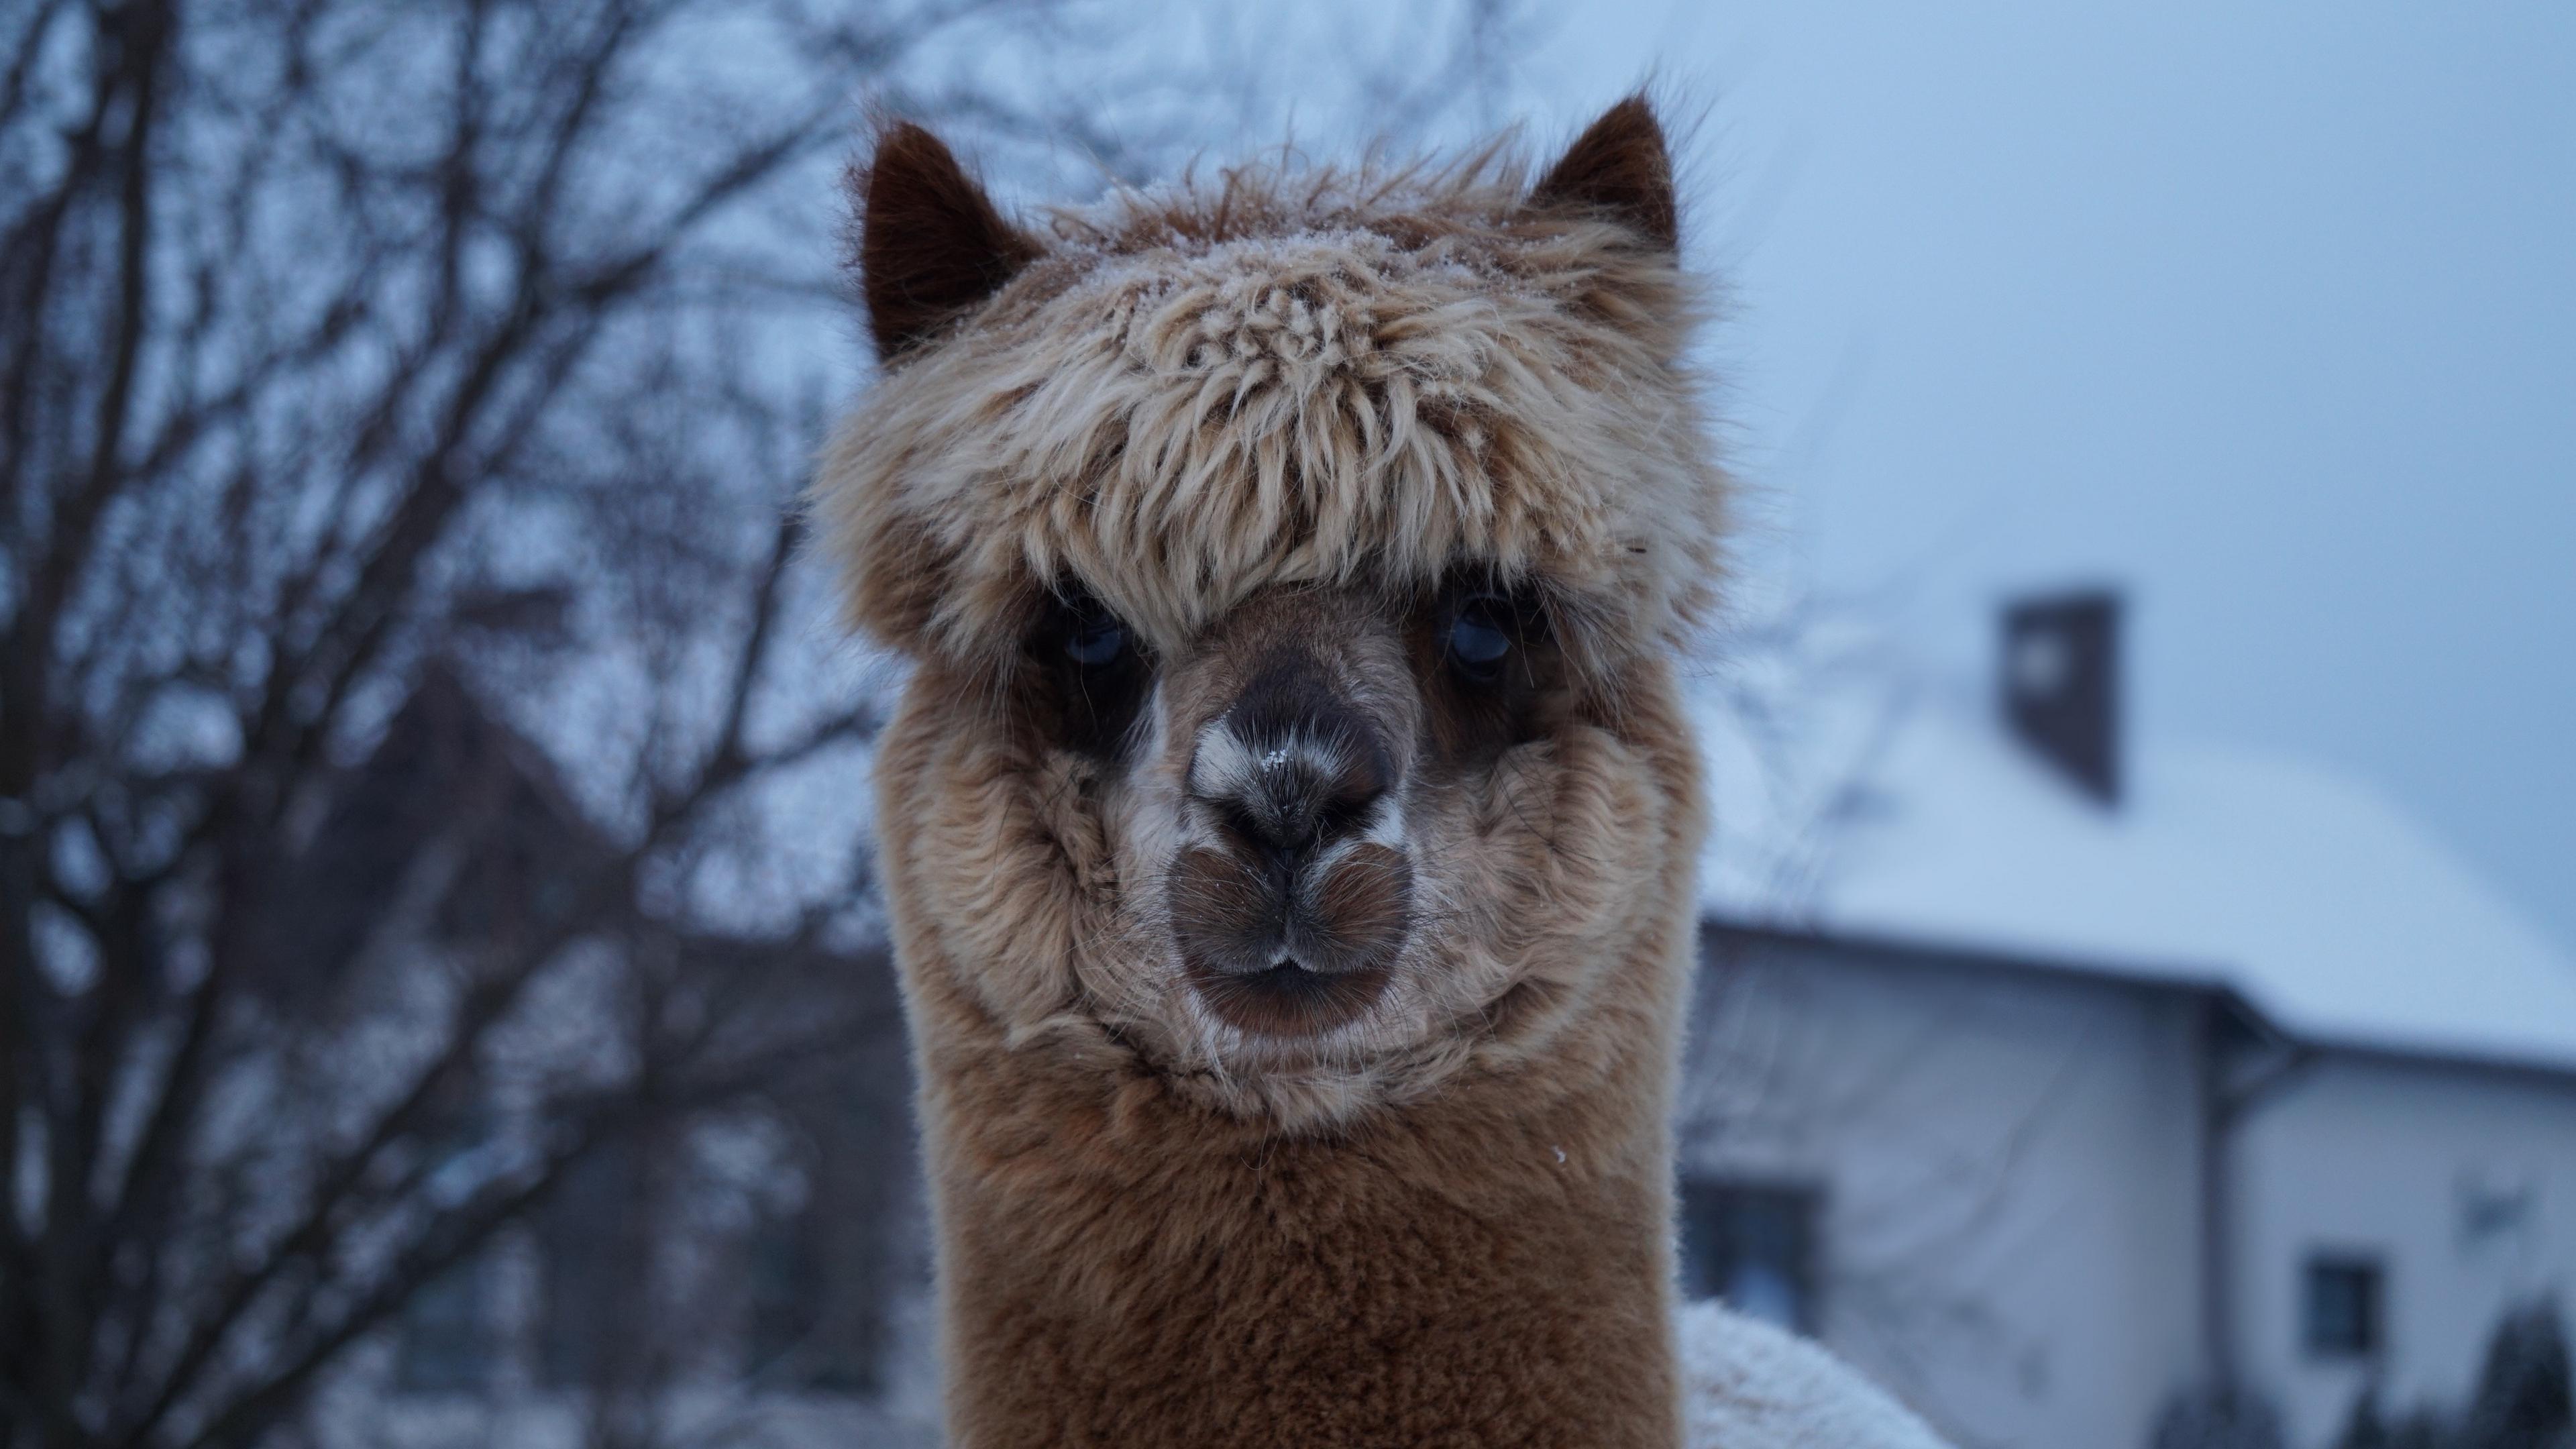 alpaca muzzle cute look 4k 1542242080 - alpaca, muzzle, cute, look 4k - muzzle, Cute, alpaca